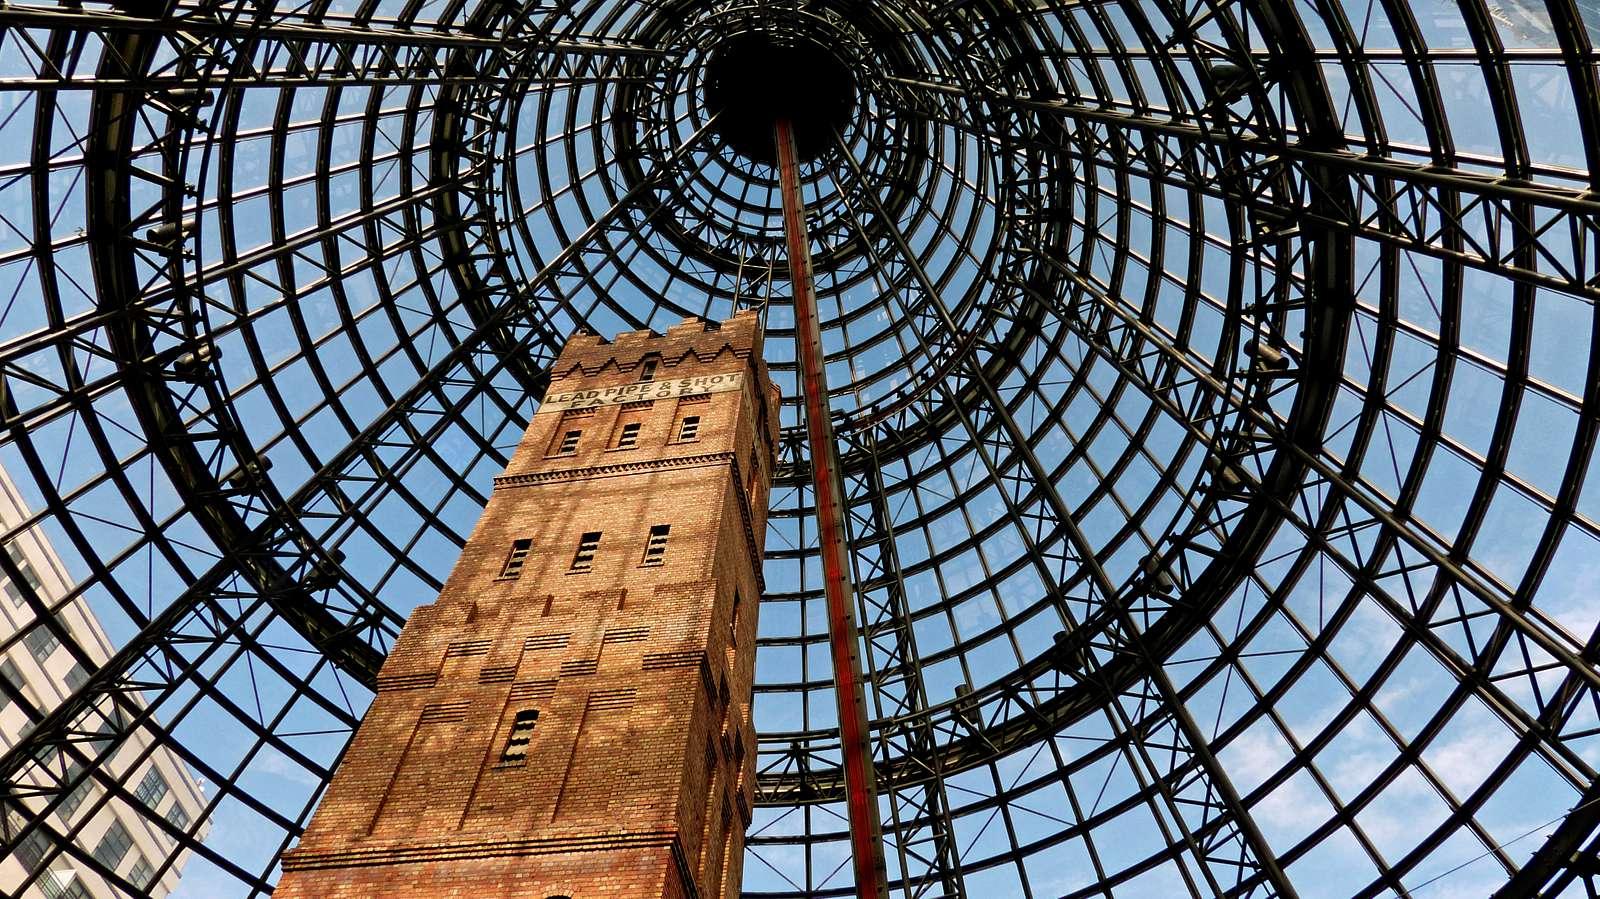 Coop's Shot Tower. Melbourne Aust.